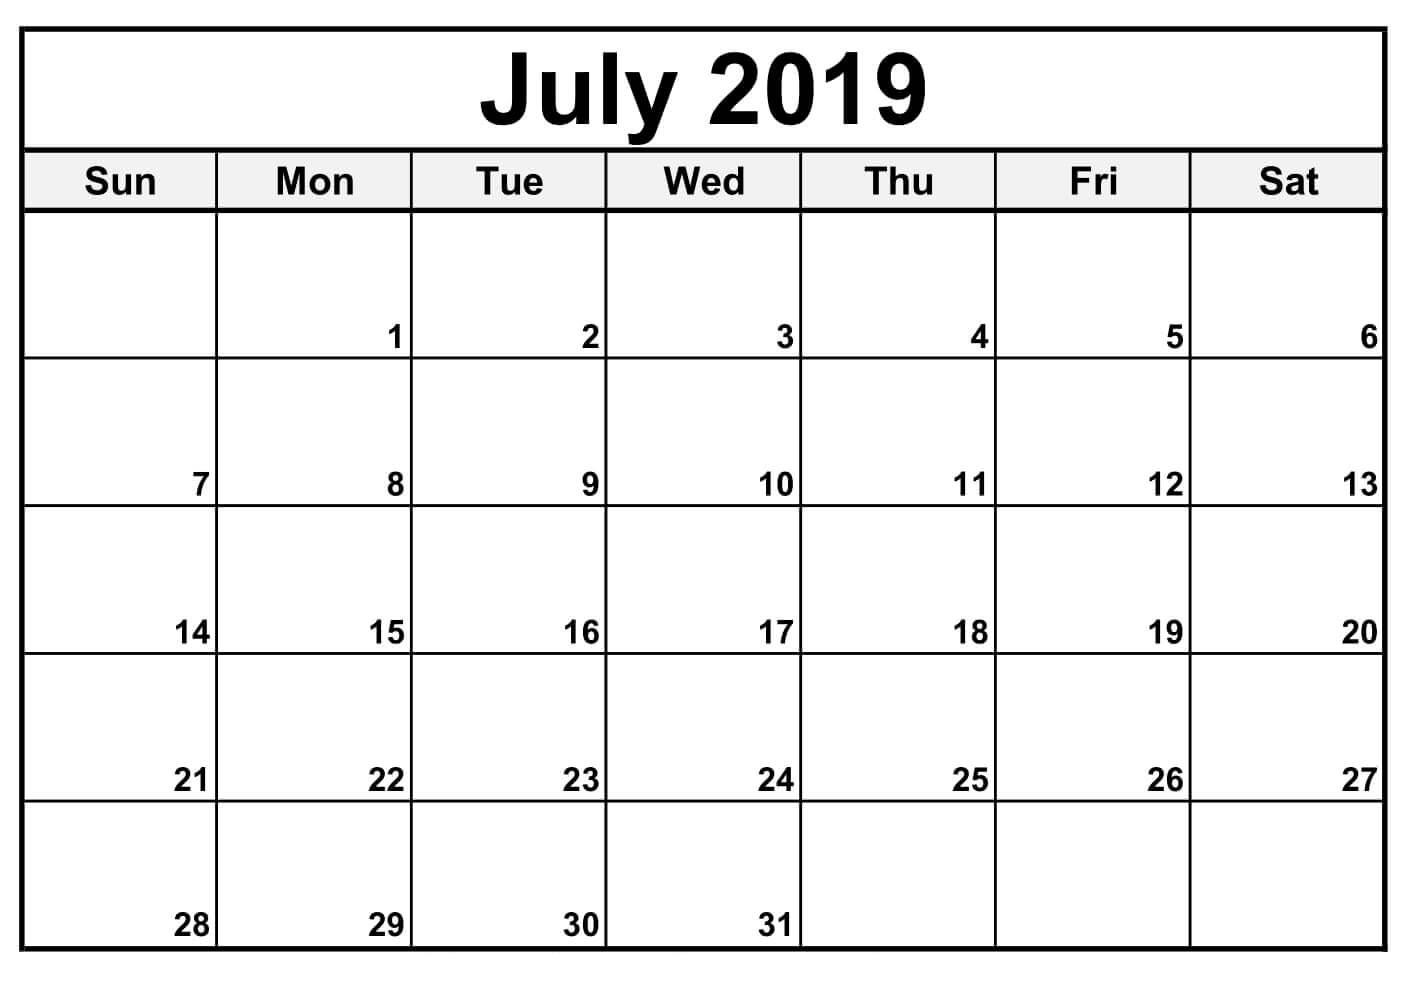 Fillable June 2019 Calendar Printable - Free Printable Calendar with regard to Free Fillable Blank Calendar Templates